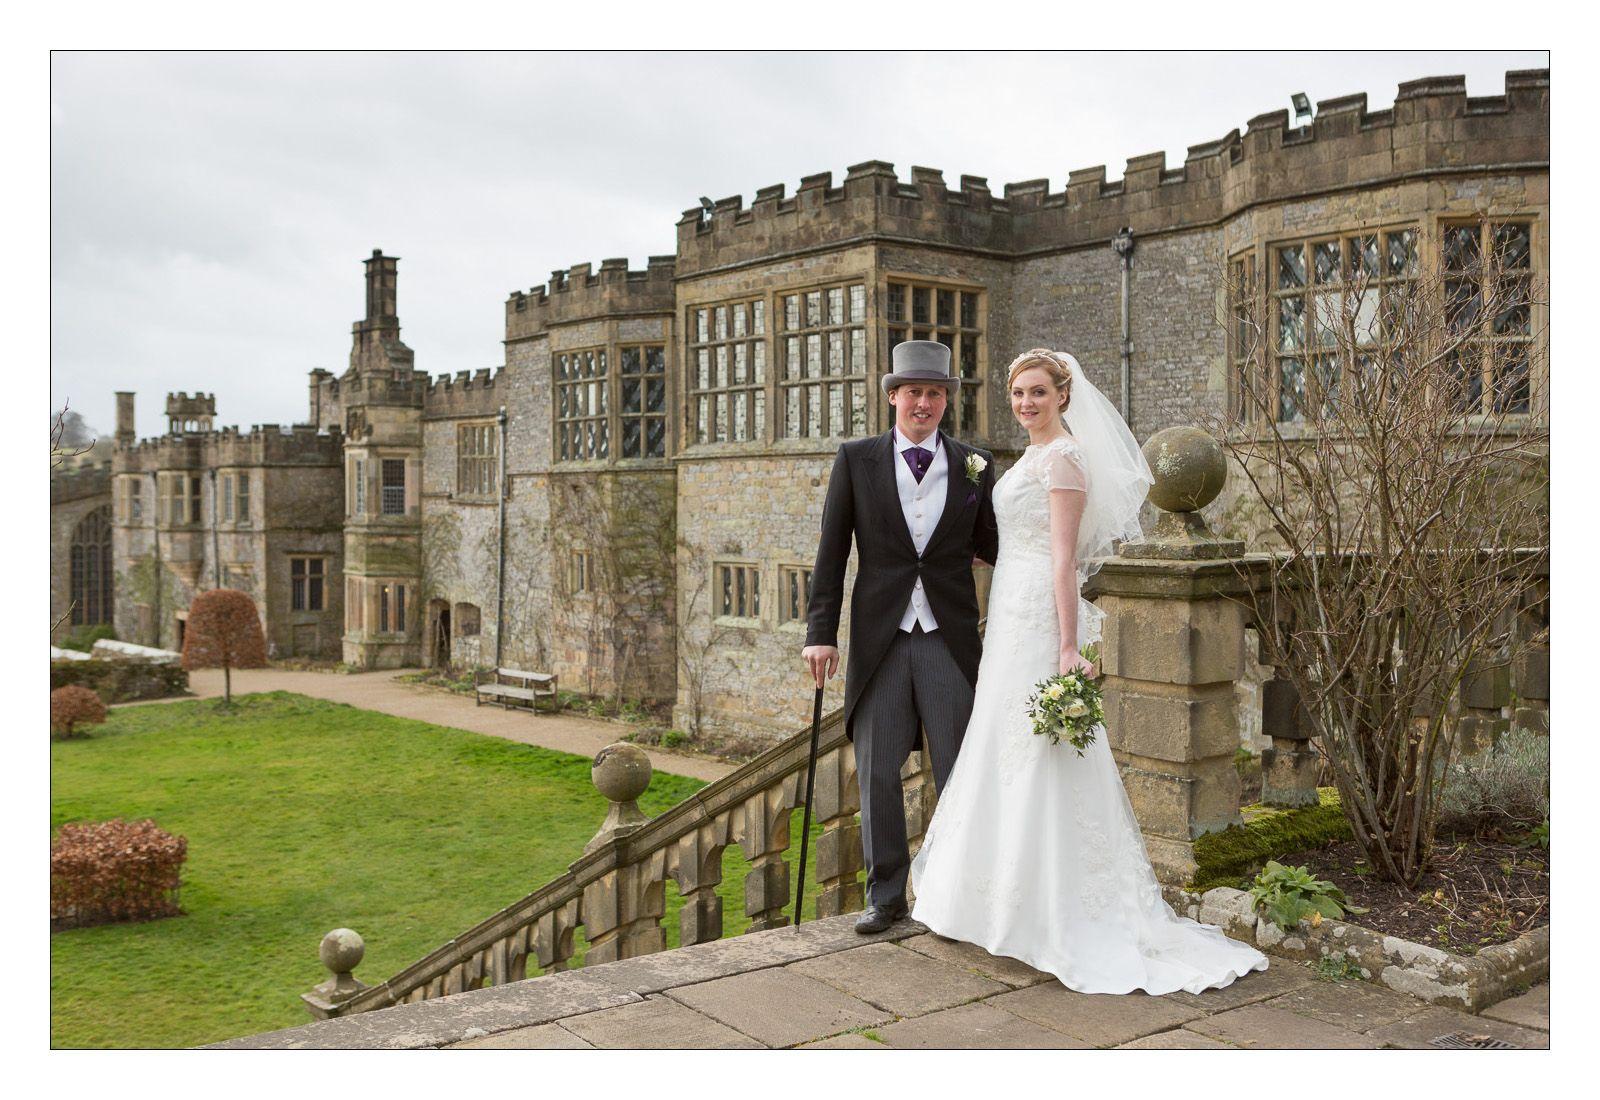 asian wedding photography east midlands%0A Haddon Hall  Bakewell  Derbyshire  Winter wedding  Gardens still beautiful   A very